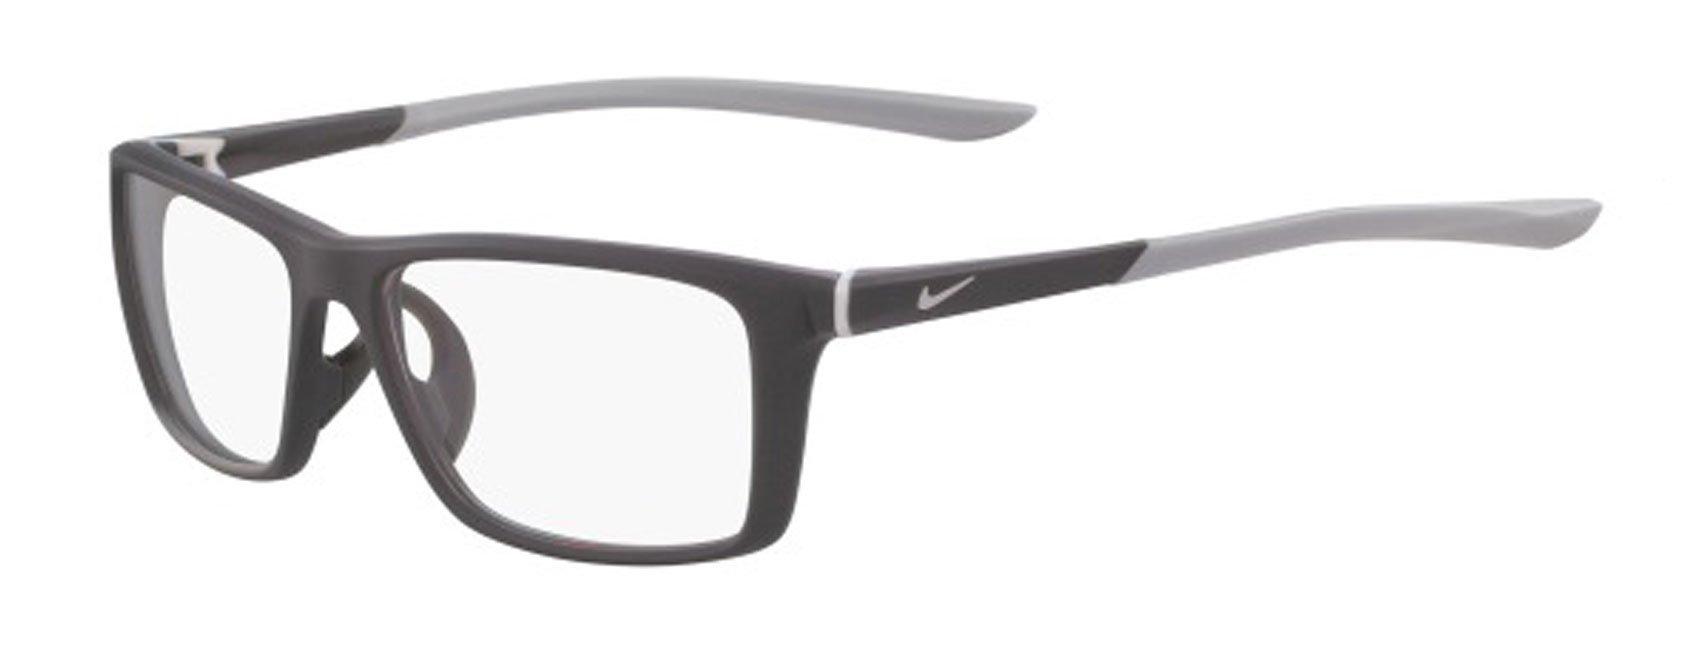 Nike Lead Glasses Matte Anthracite 7084-02